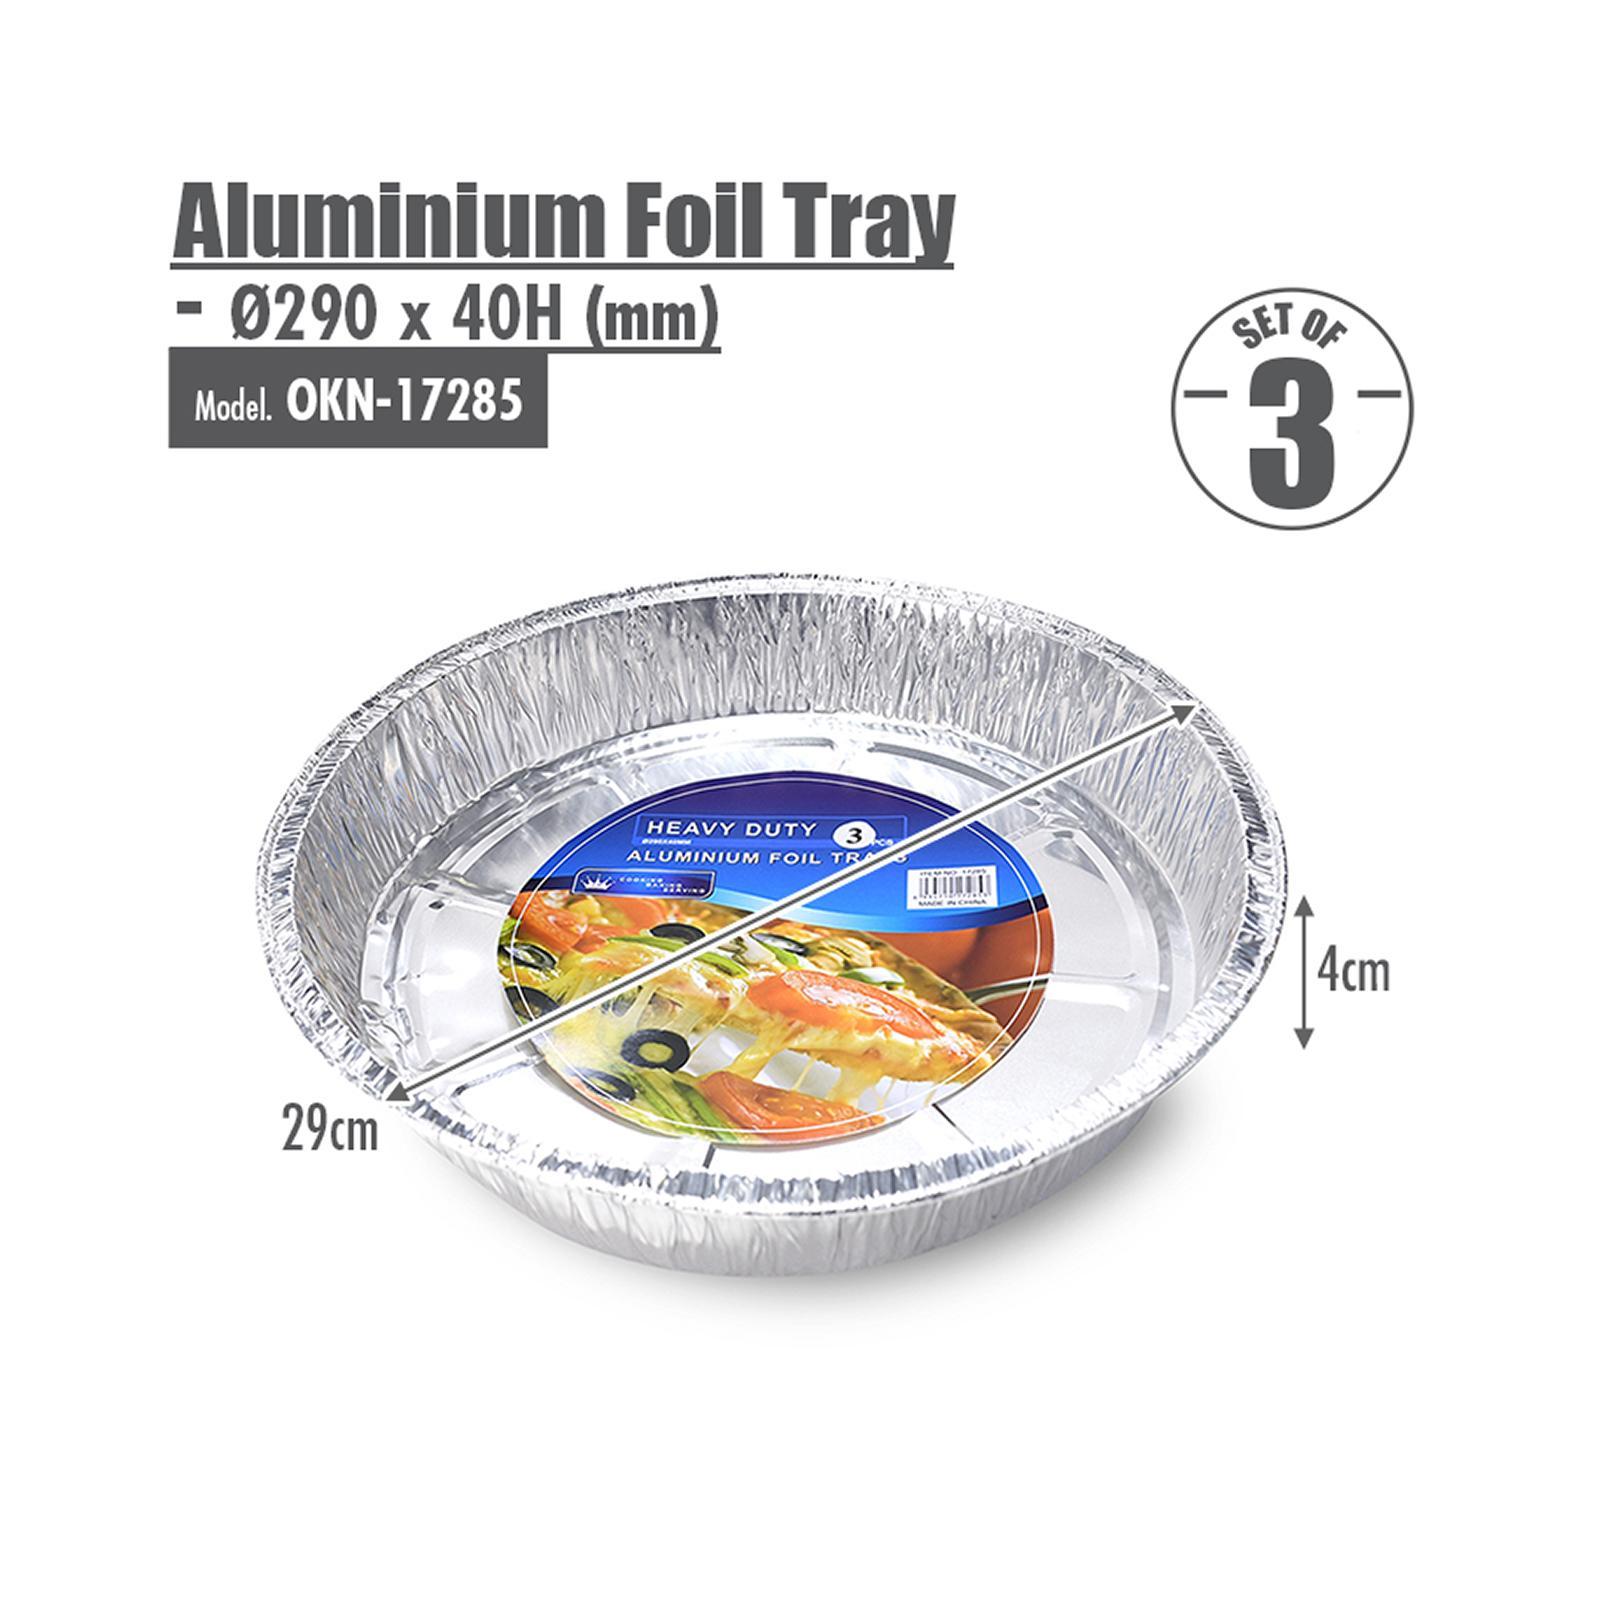 HOUZE Round Aluminium Foil Tray - Set of 3